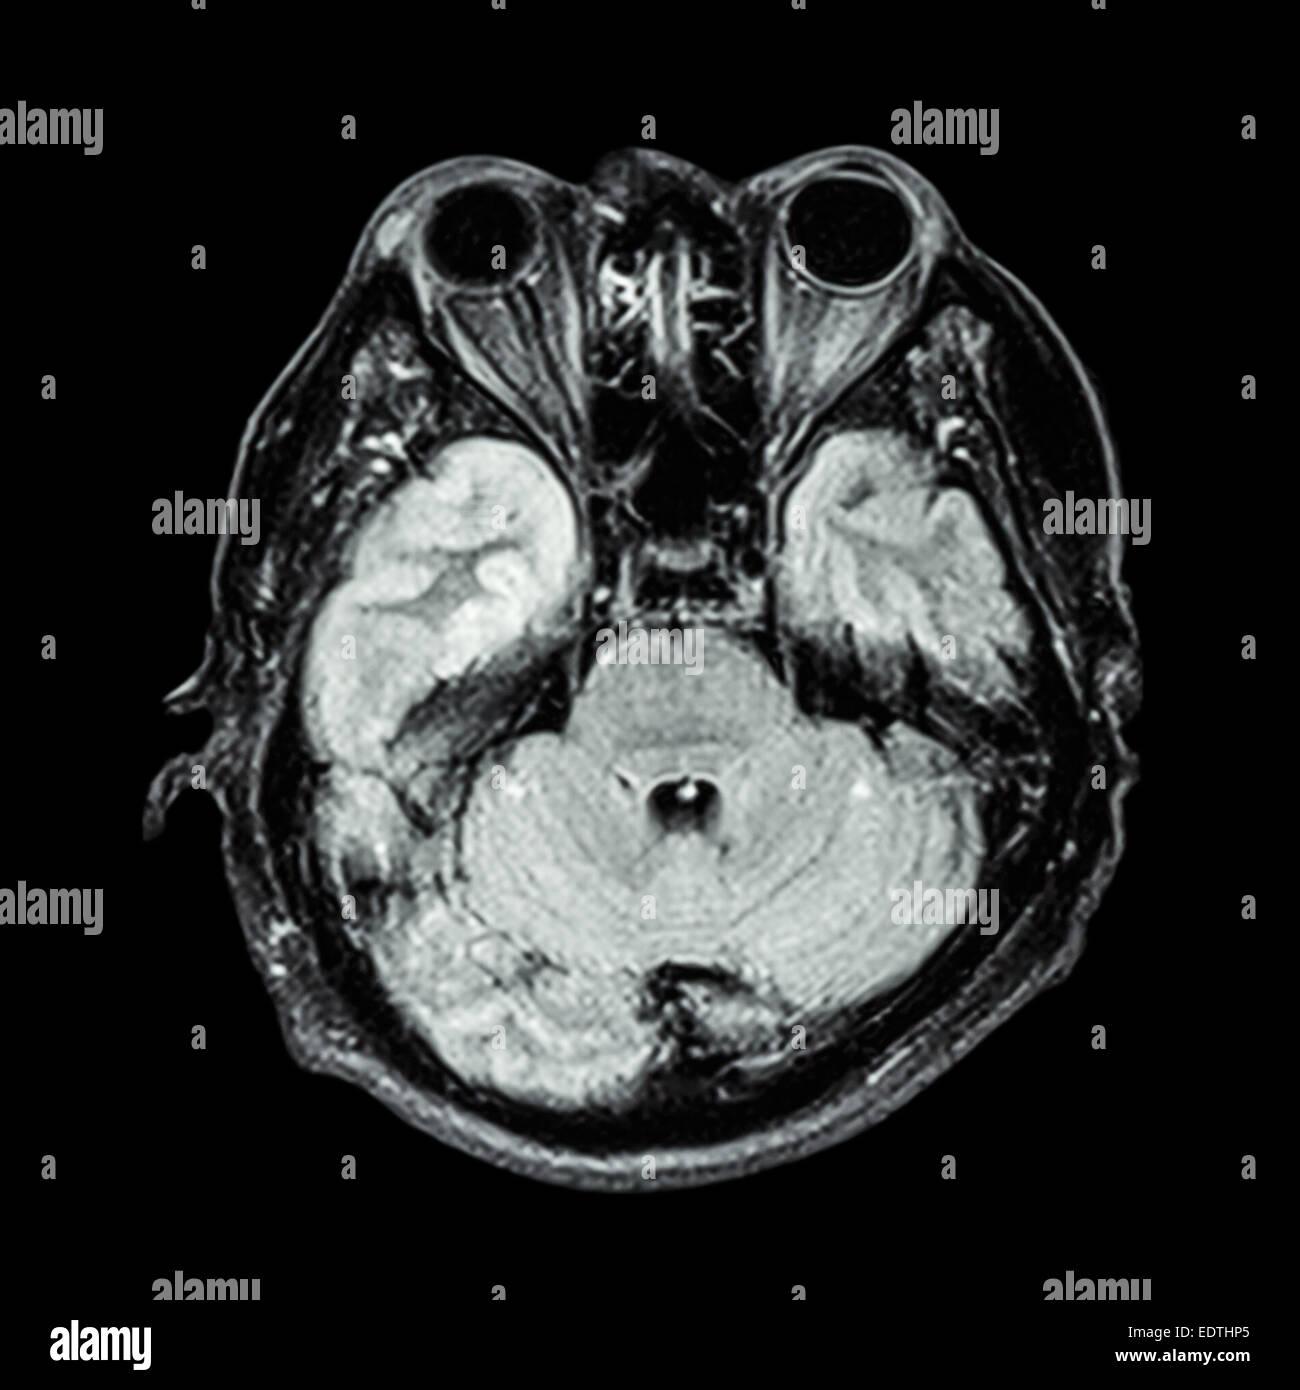 MRI brain : show lower part of brain(cerebellum,temporal lobe of cerebrum,brain stem,eye,ethmoid sinus,structure - Stock Image